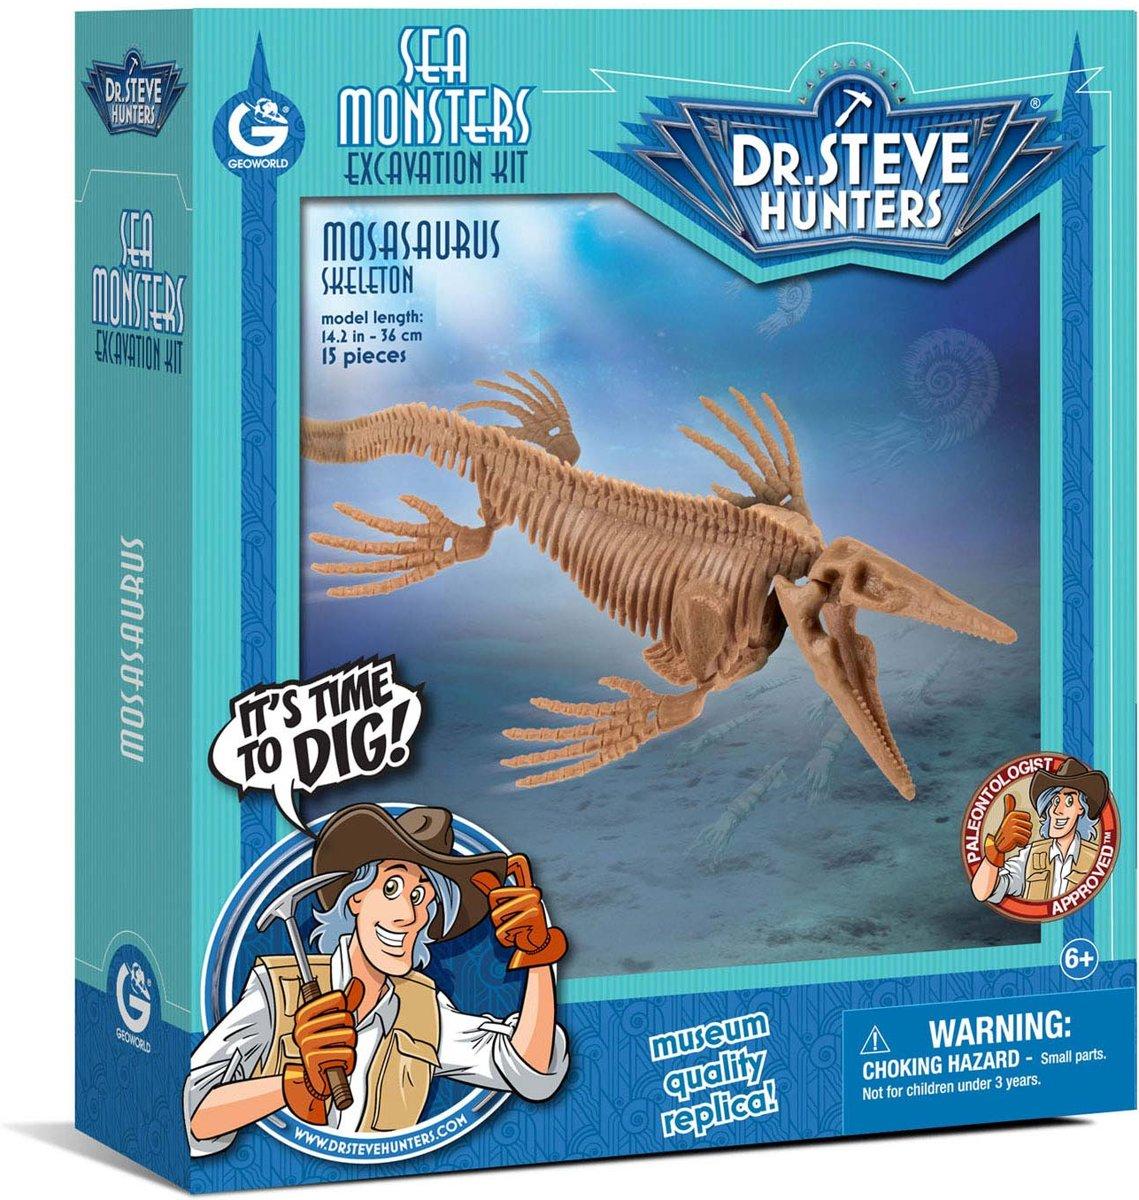 Sea Monsters Excavation Kit - Mosasaurus Skeleton kopen